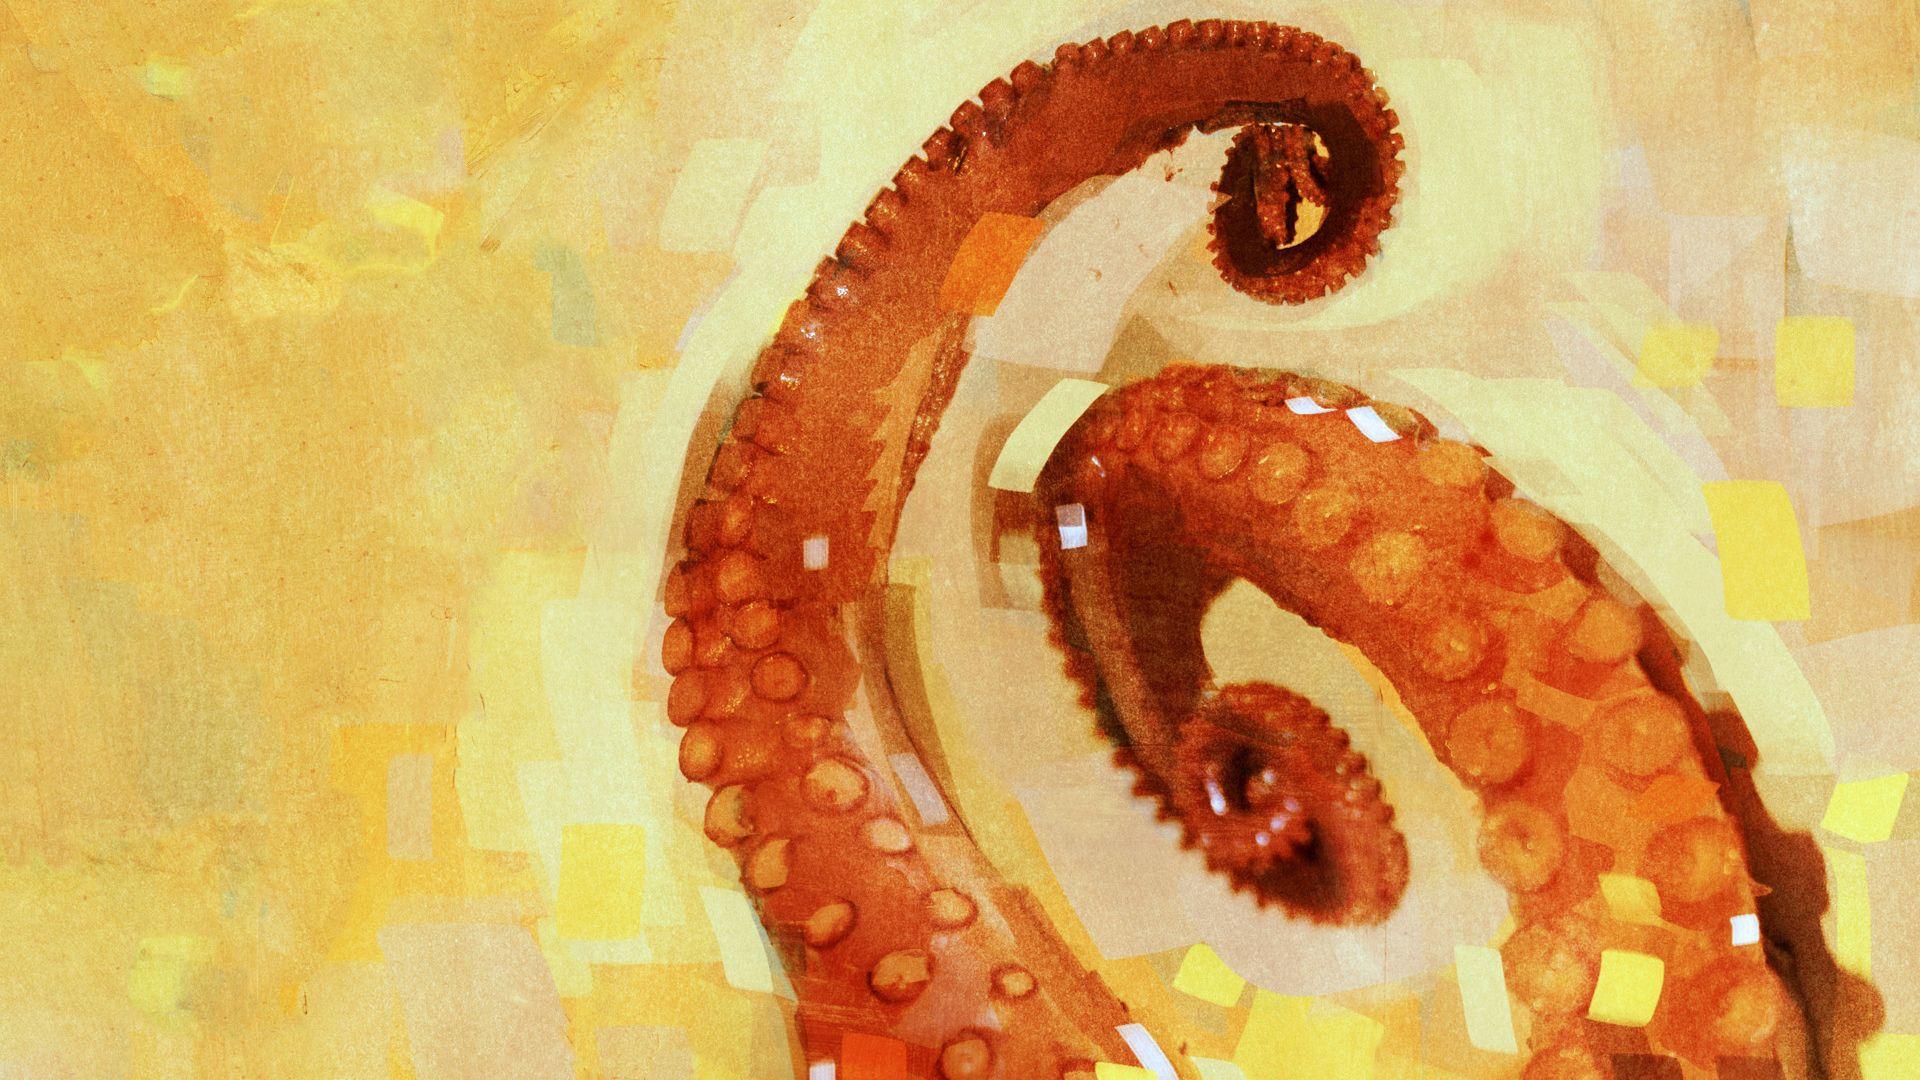 Octopus Tentacles Wallpaper